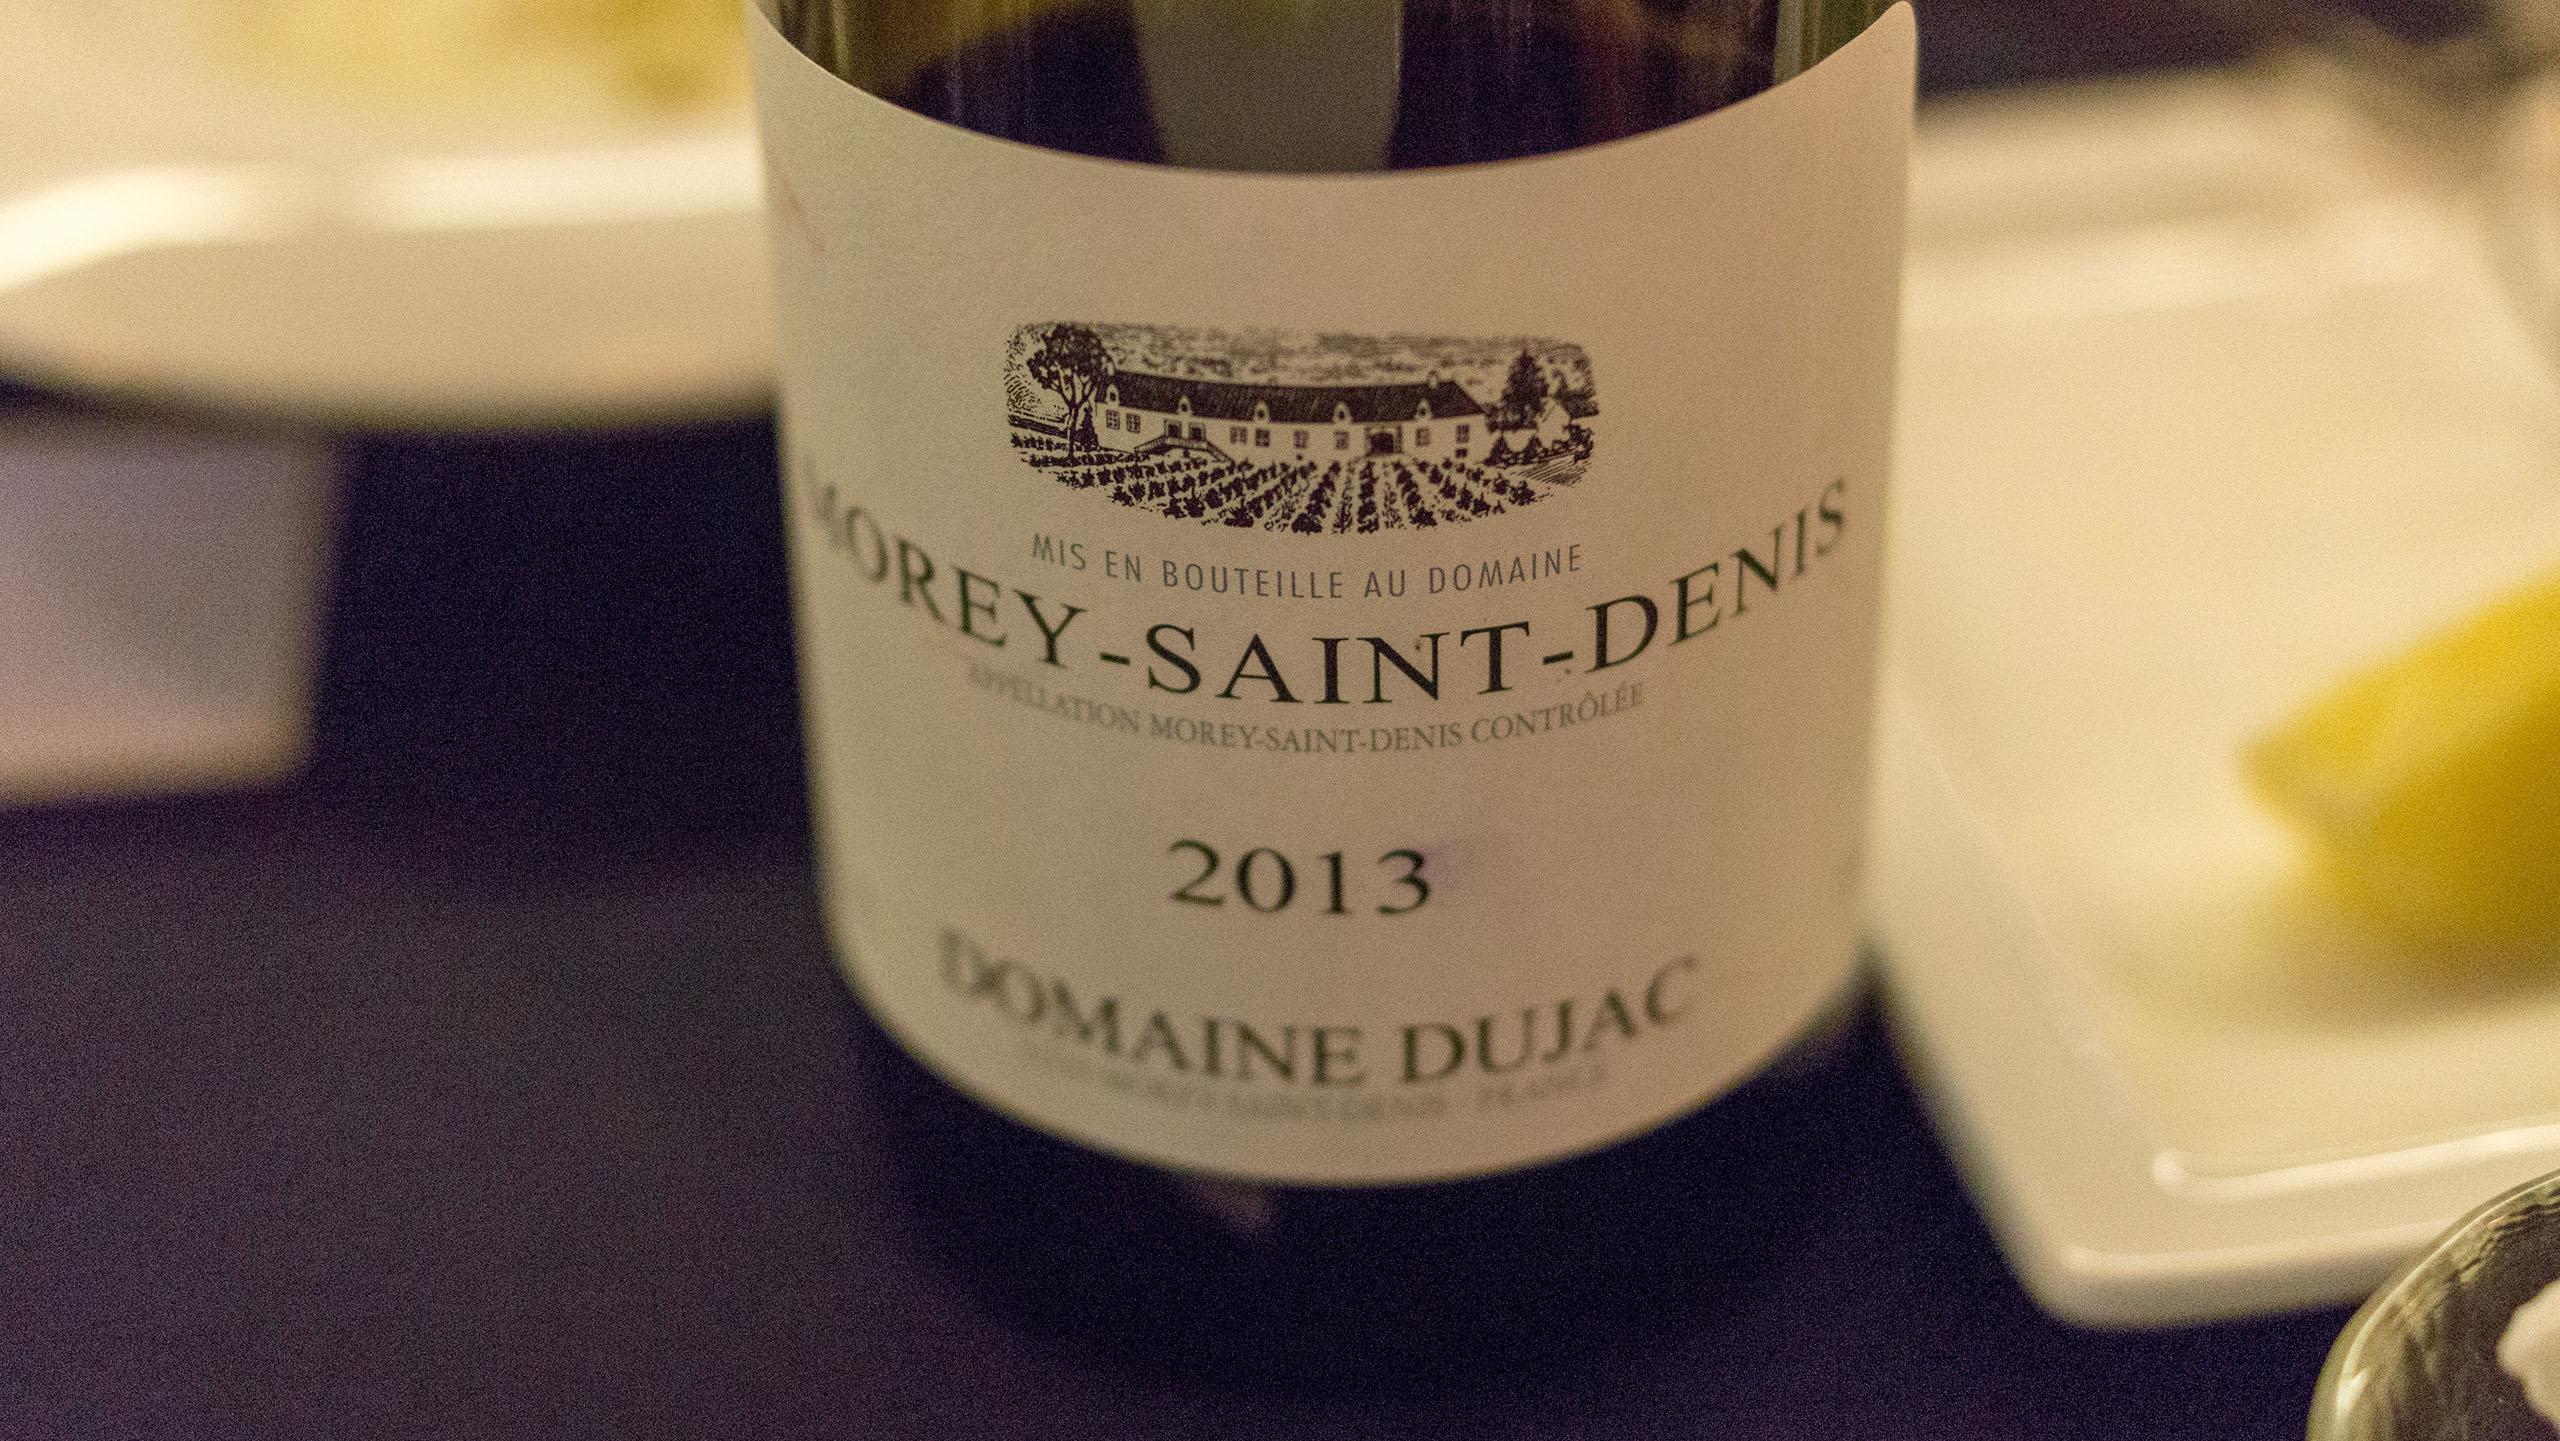 Domaine Dujac MOREY-SAINT-DENIS 2013